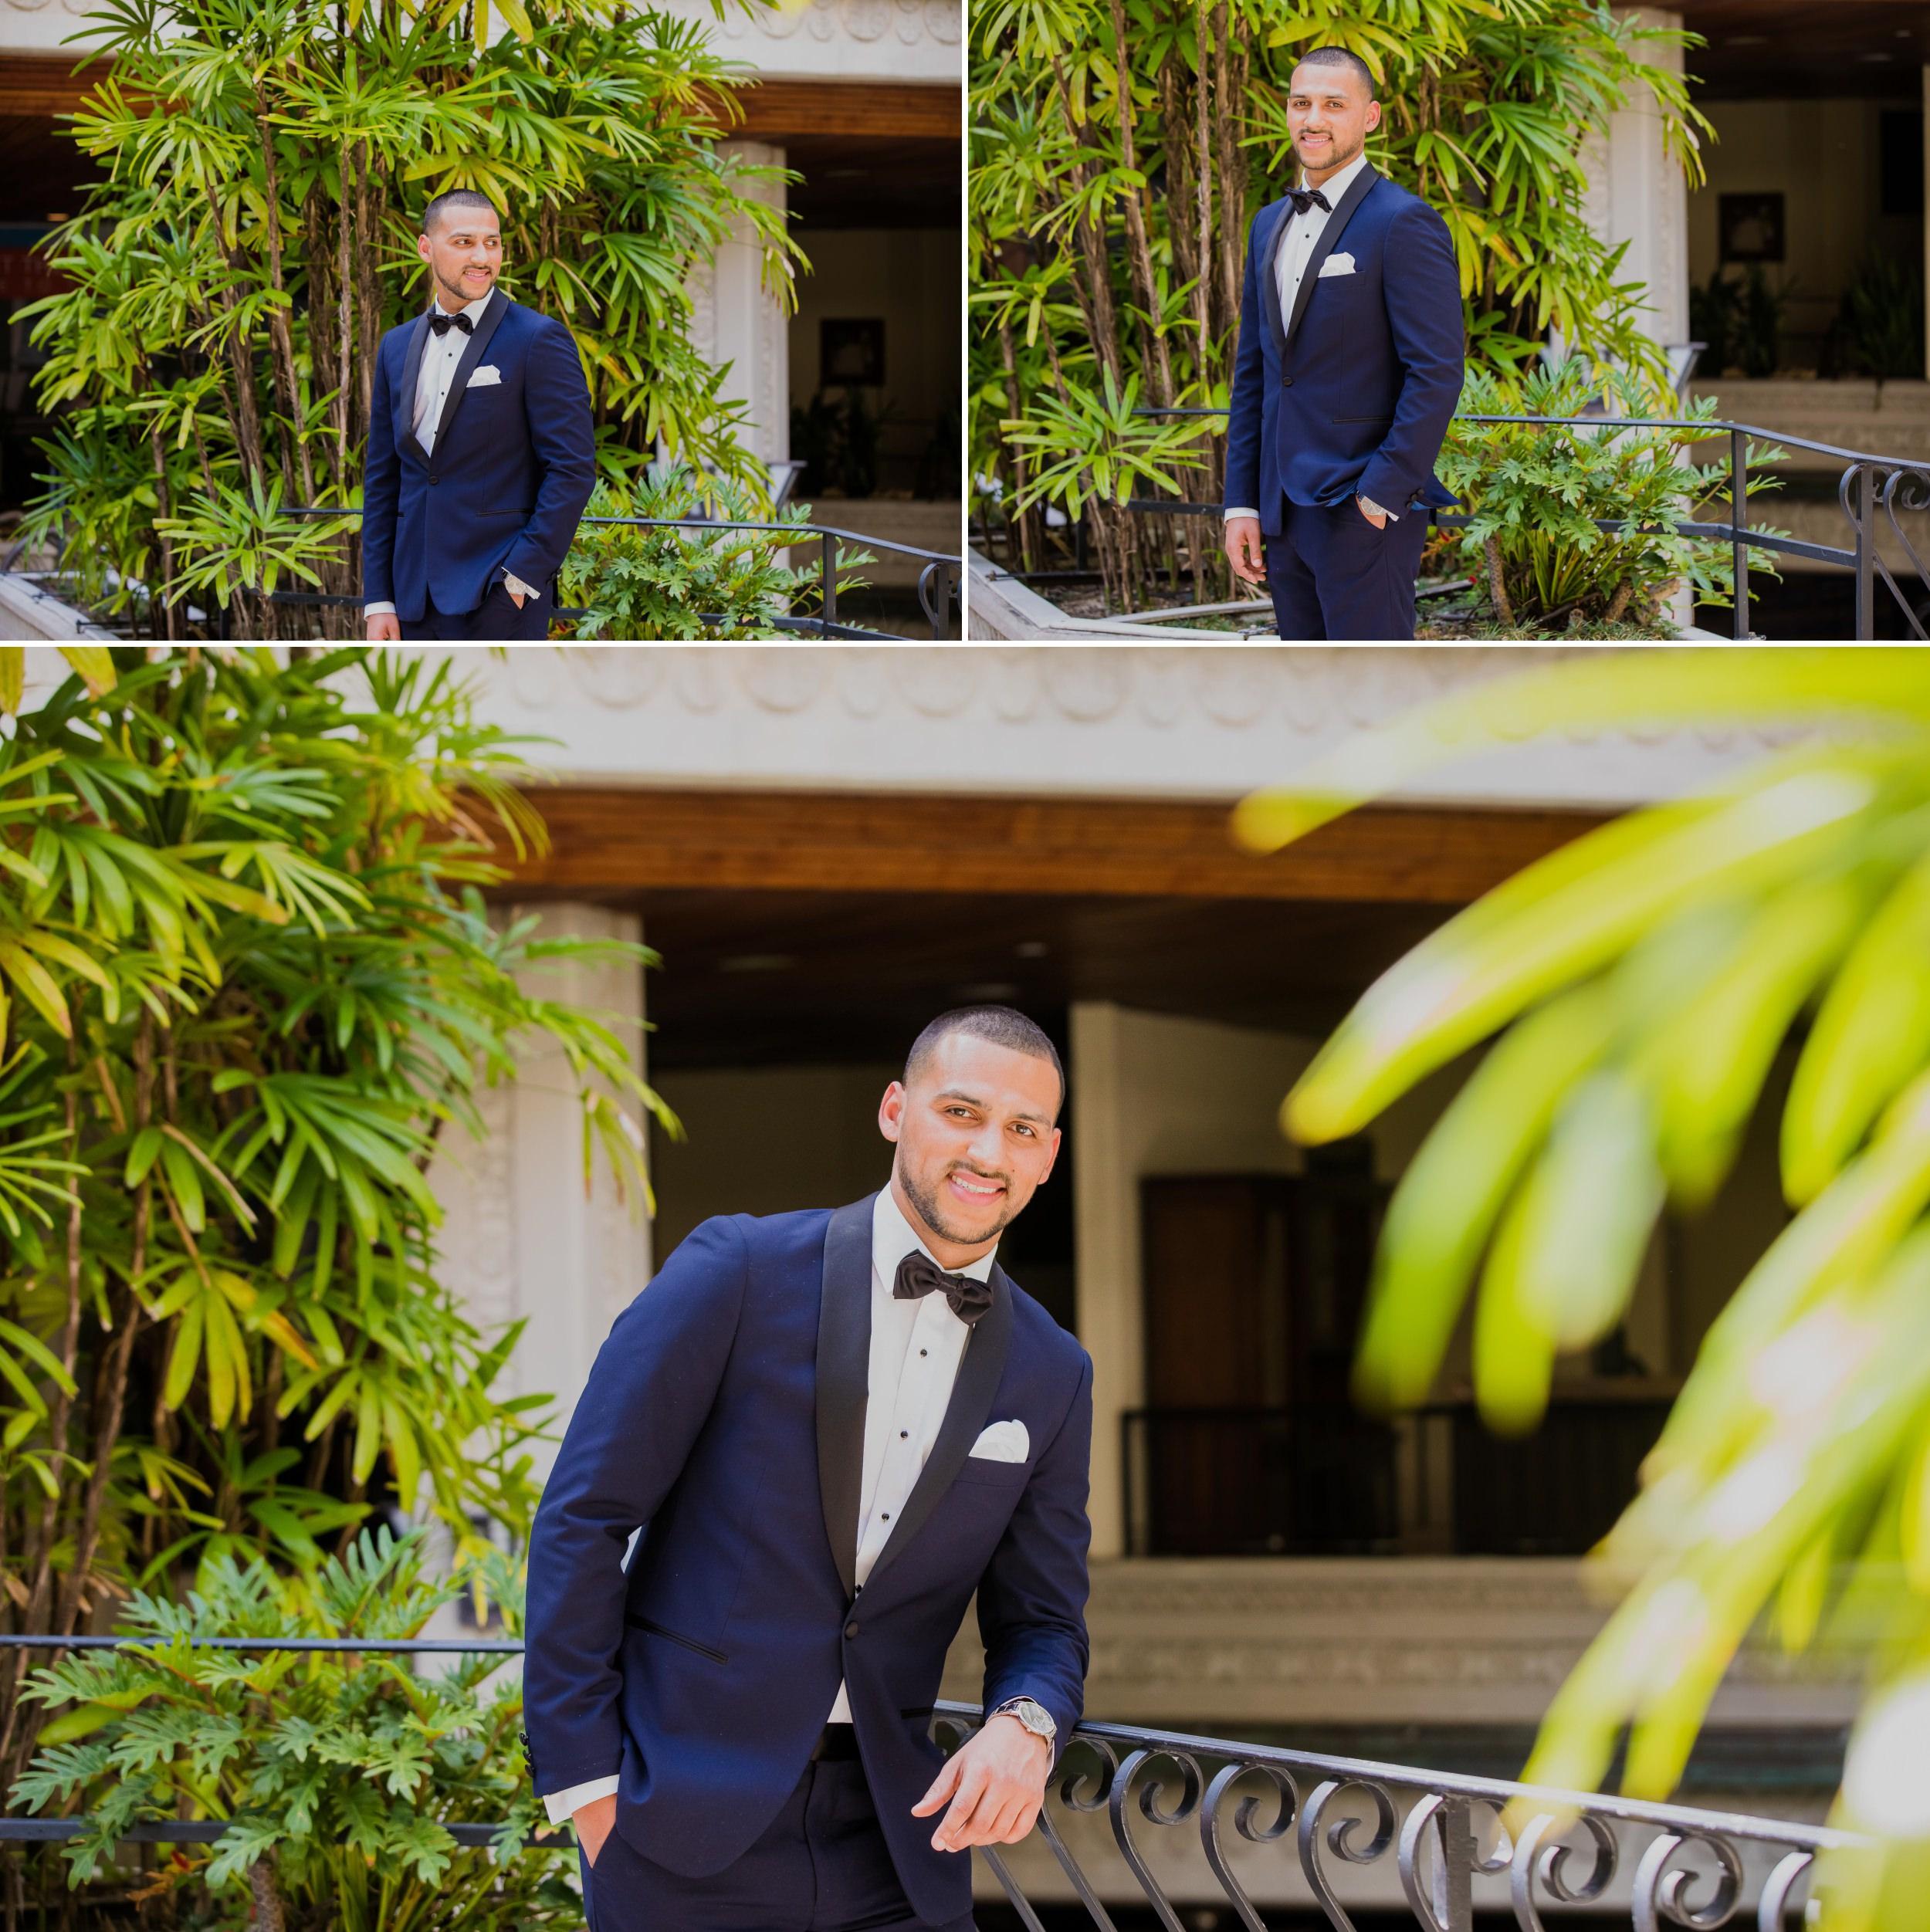 Wedding - Rusty Pelican - Key Biscayne - Santy Martinez Photography 10.jpg